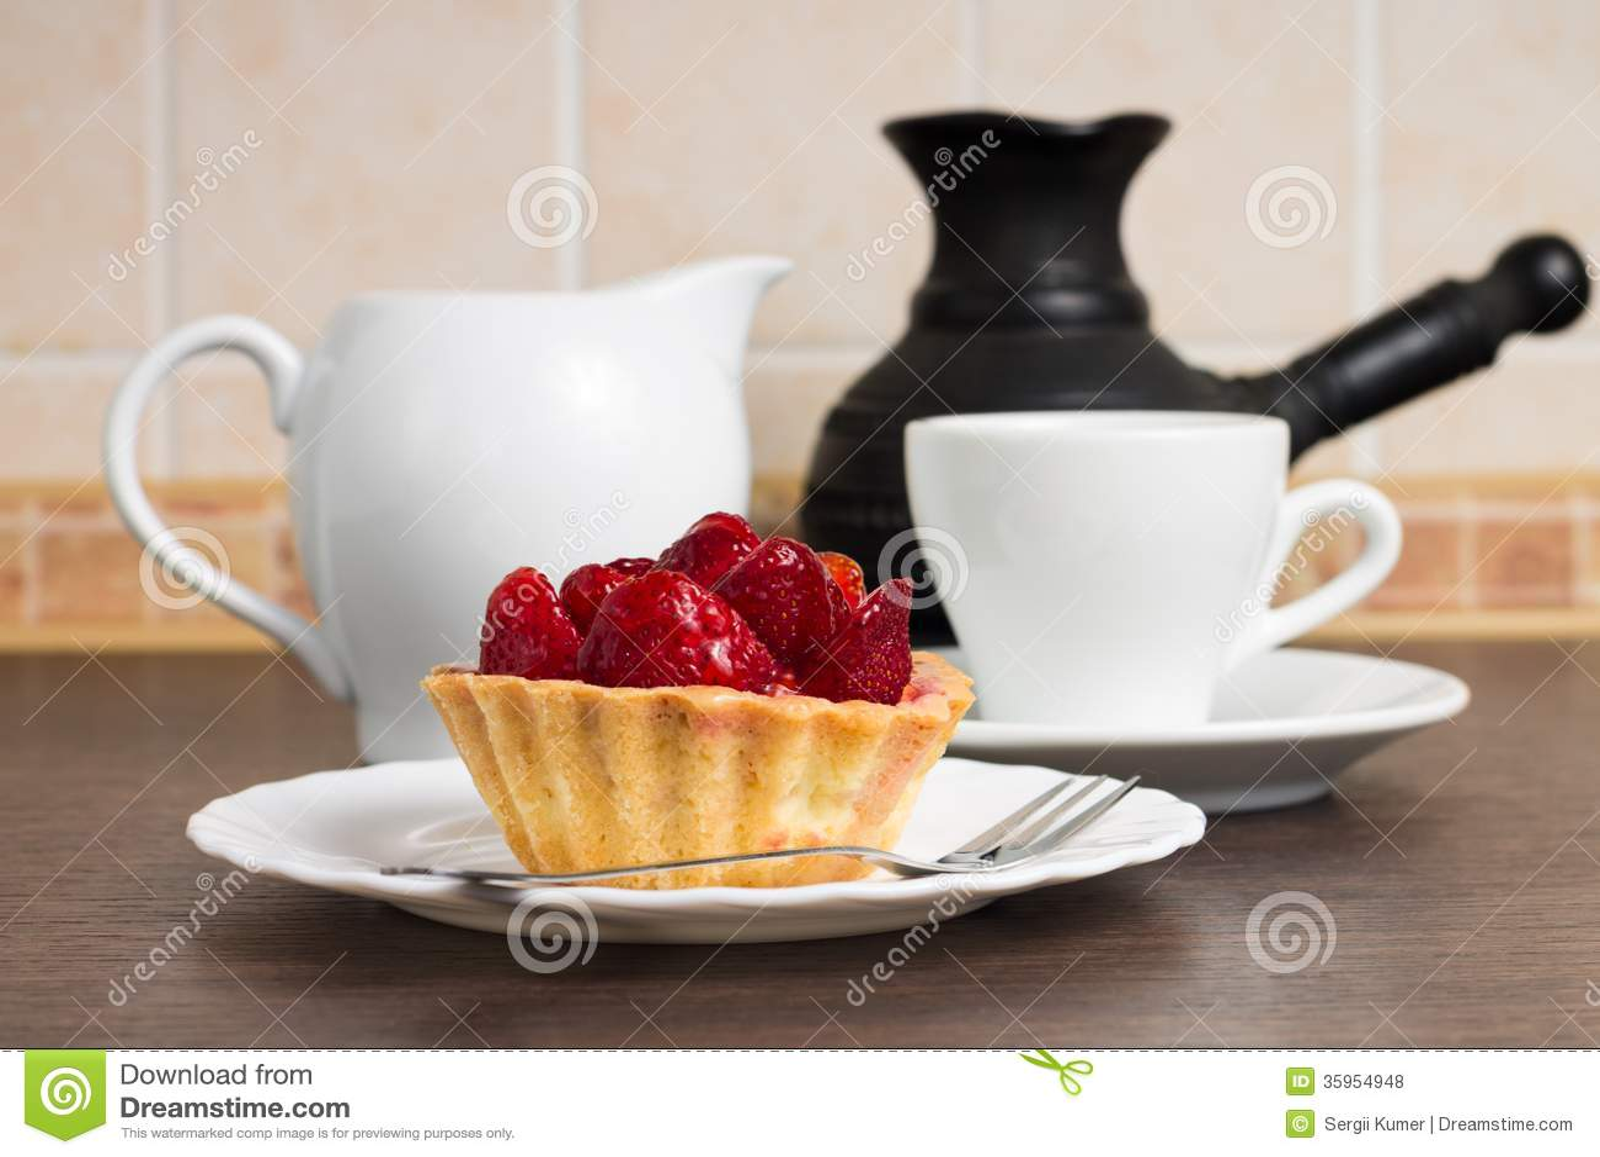 Postre de la fresa con la taza de café